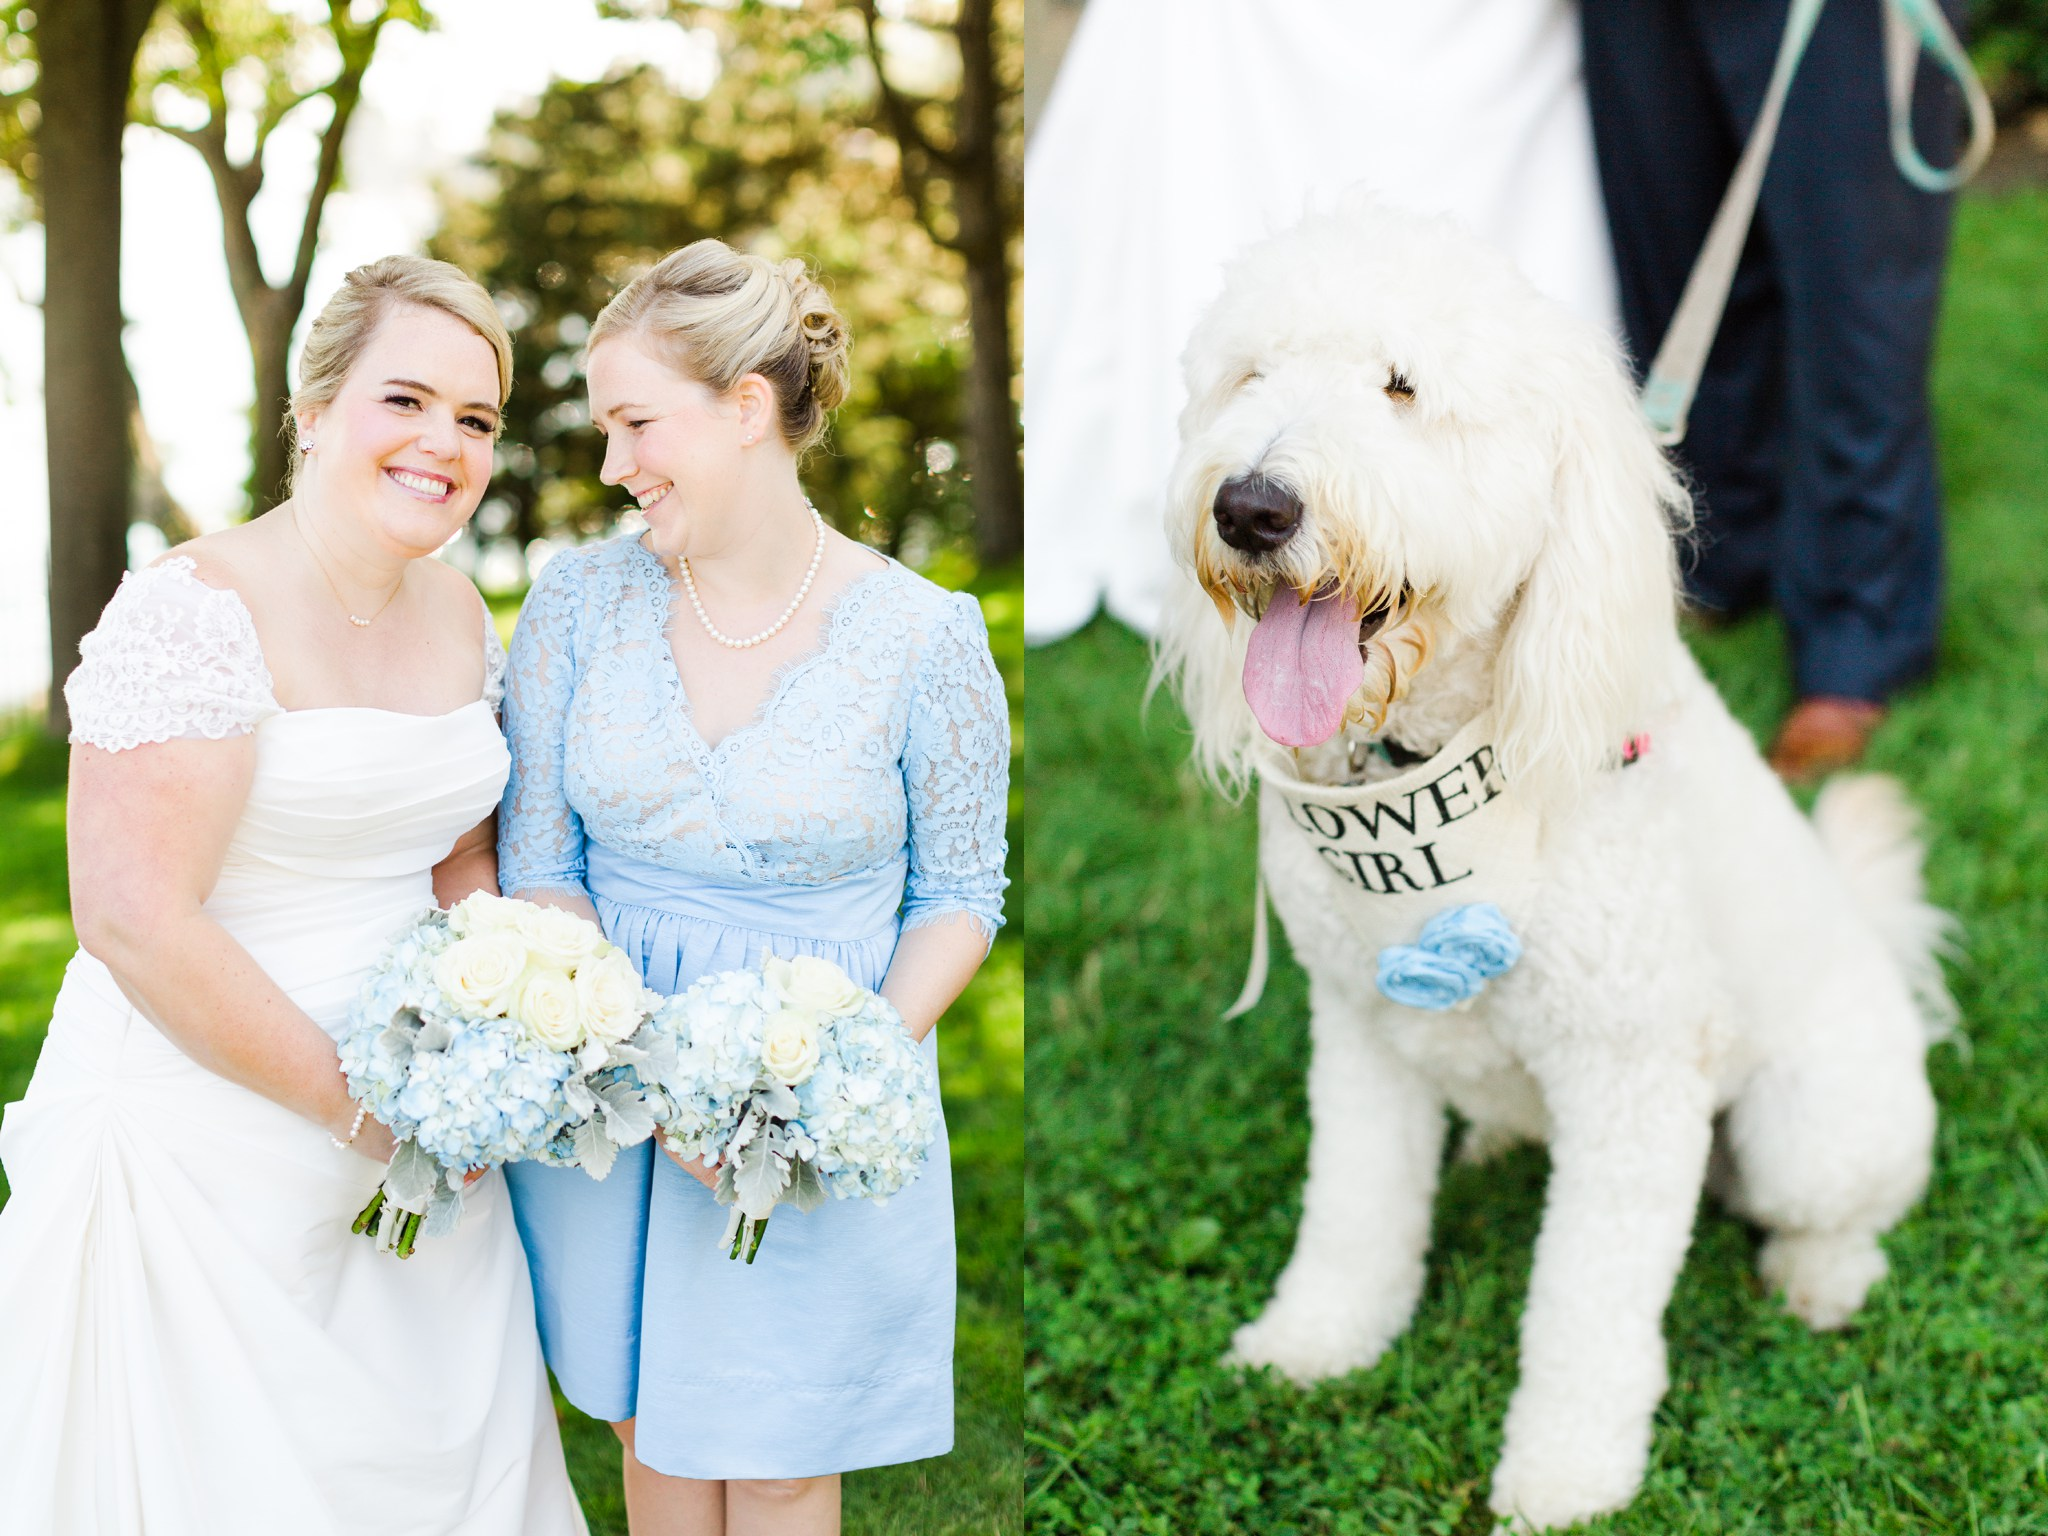 misselwood_endicott_college_wedding_photos_00028.JPG